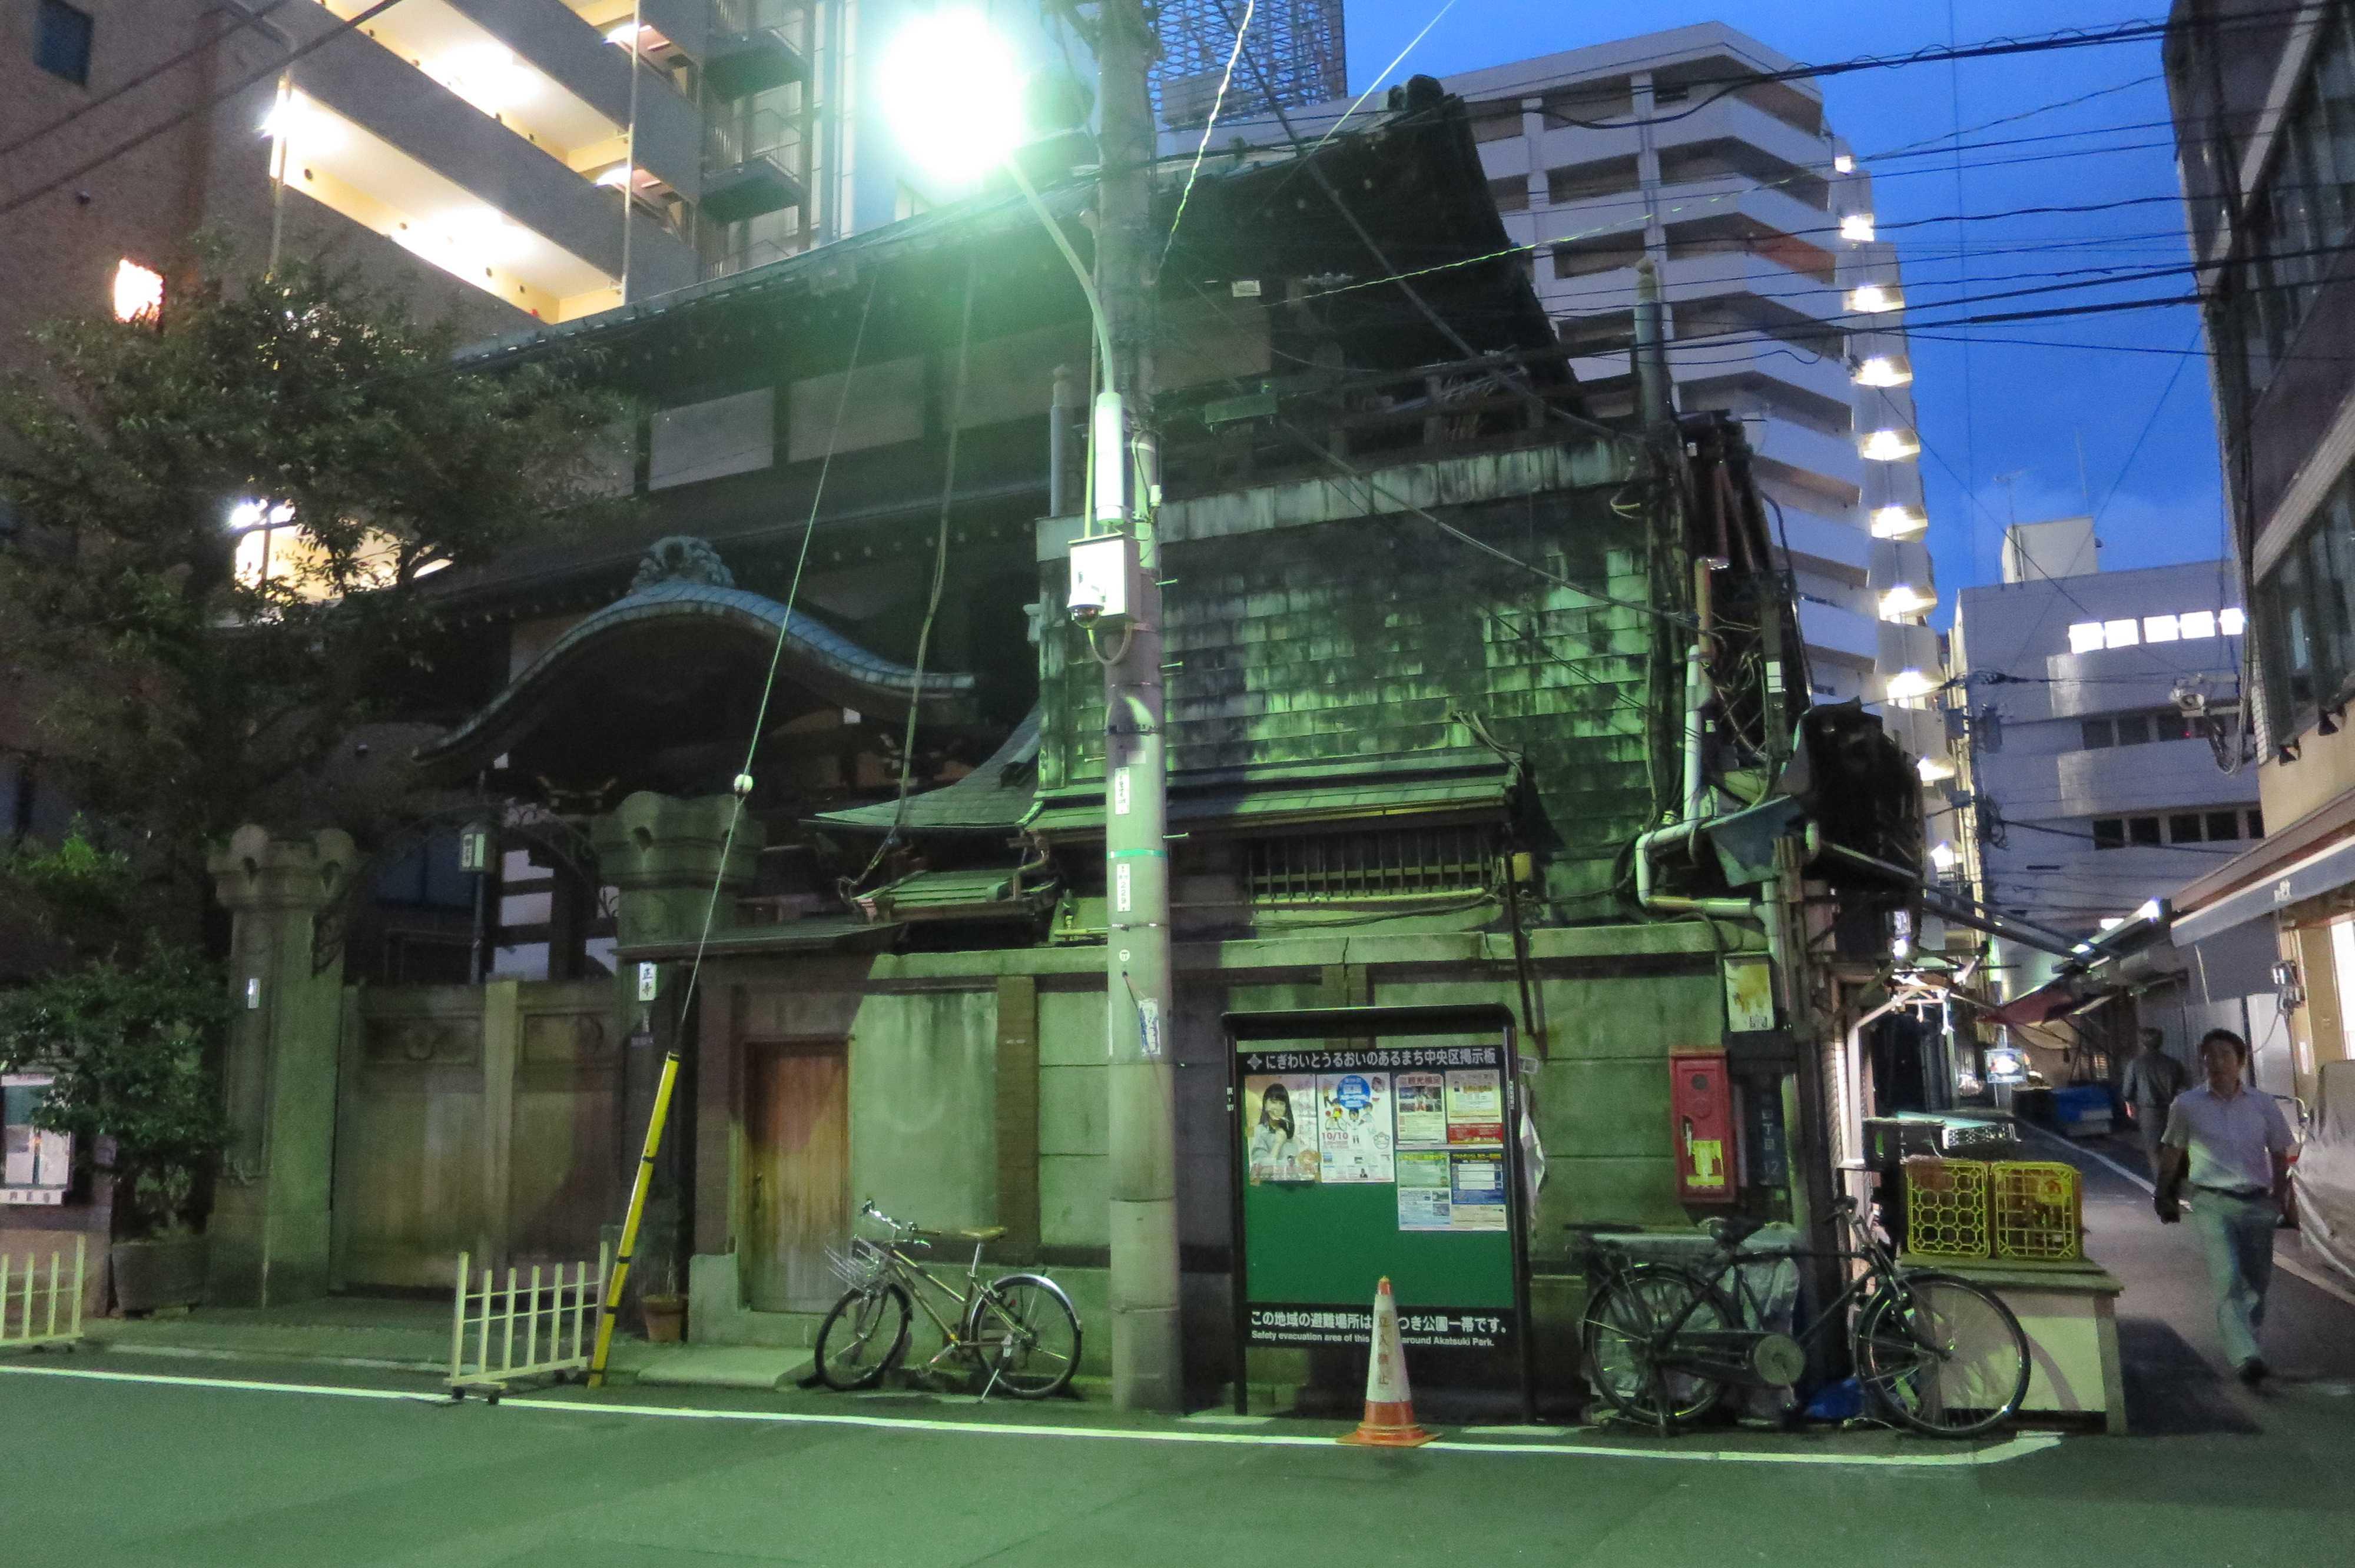 古い木造寺社建築・円正寺(築地エリア/築地場外市場)